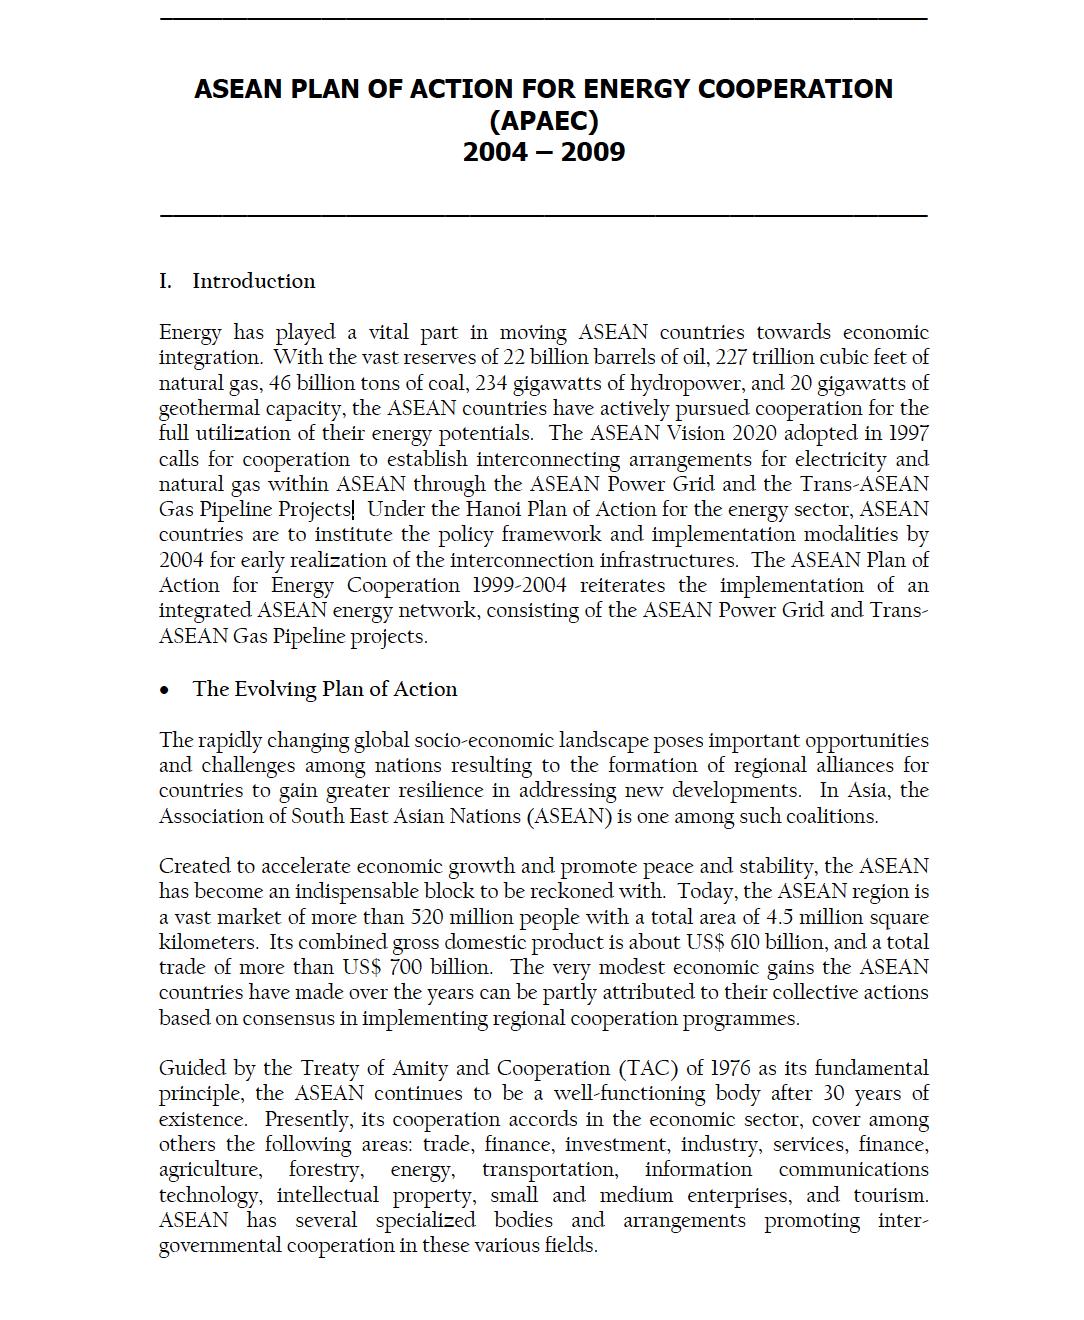 APAEC 2004-2009_img